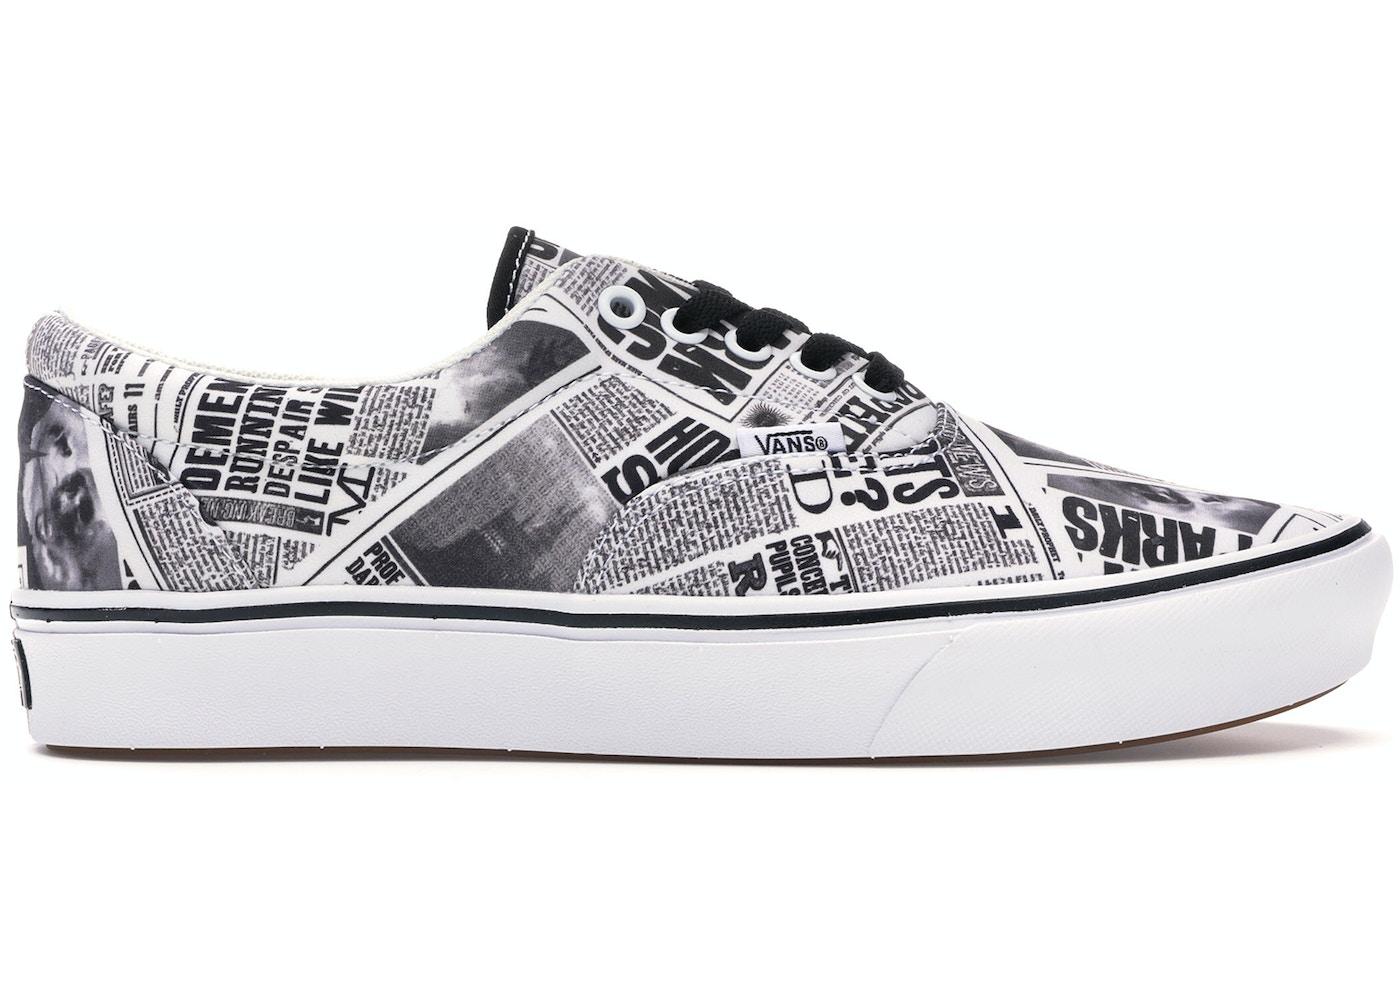 5fdf18d7dfc36 Vans Footwear - Buy Deadstock Sneakers